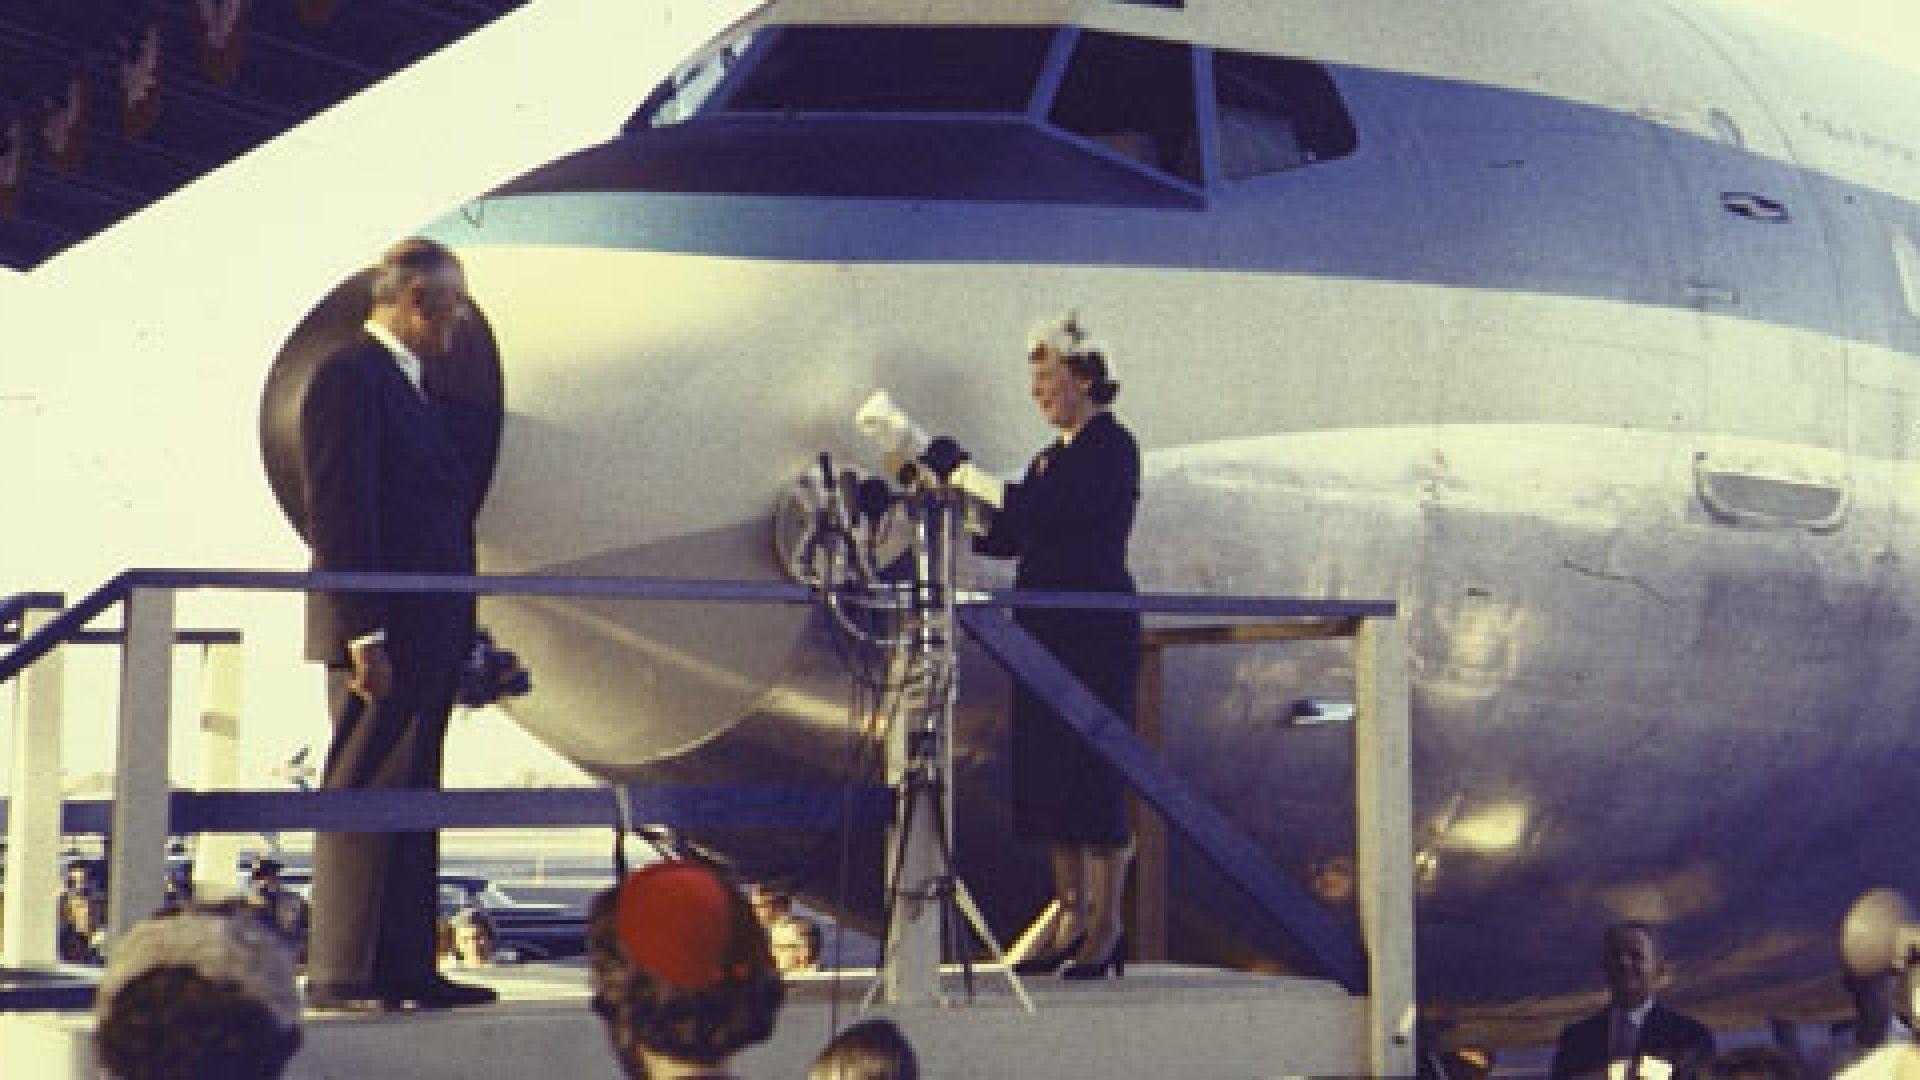 Mrs. Dwight Eisenhower christening Pan Am's Boeing 707 America at Natl. Airport as Pan Am Pres. Juan Trippe looks on.